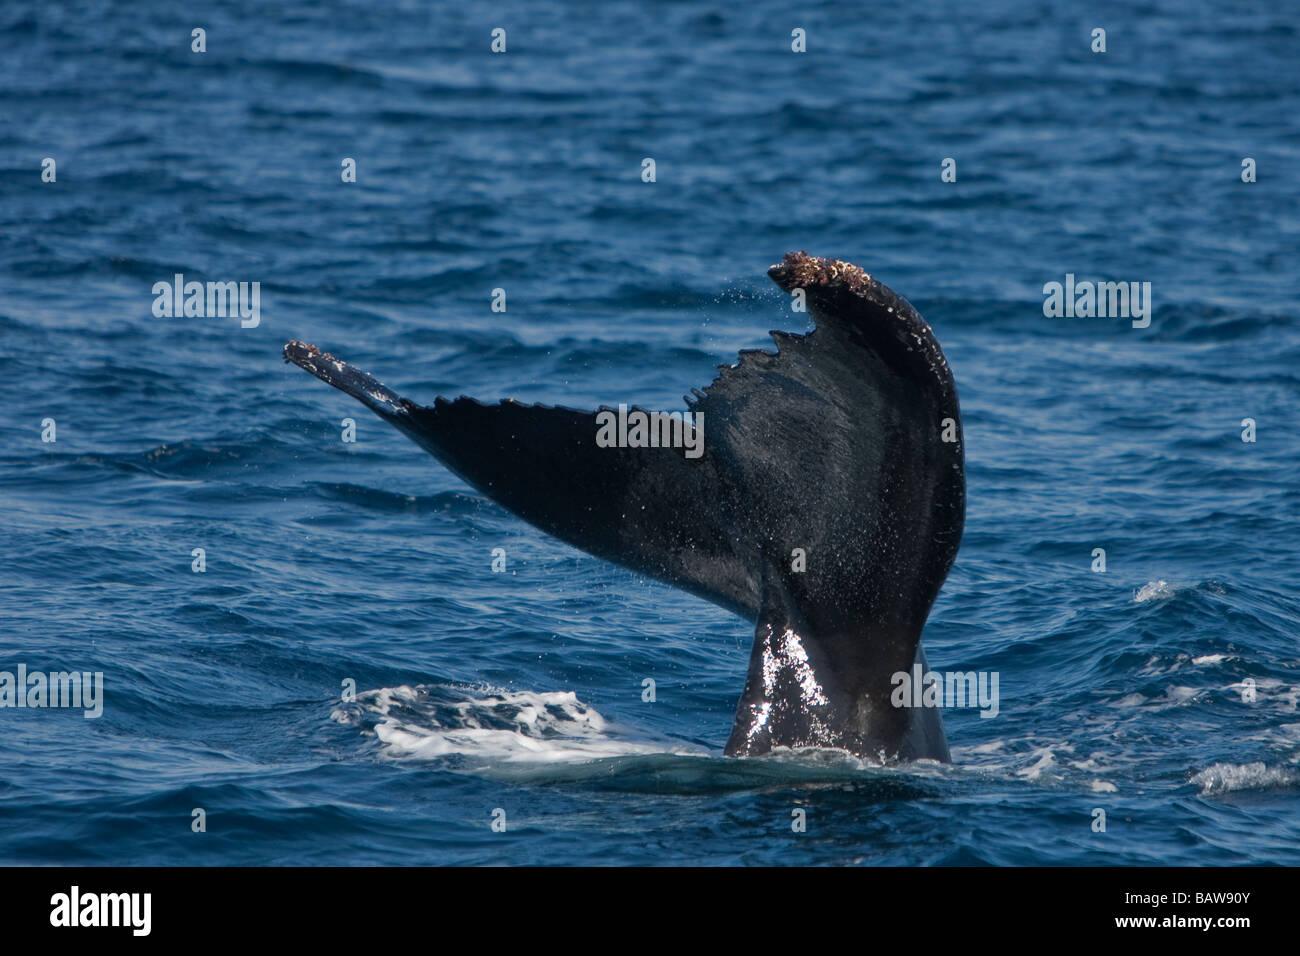 Humpback whale Megaptera novaeanglia Buckelwal lobtailing Gorda Banks Baja California Mexico - Stock Image